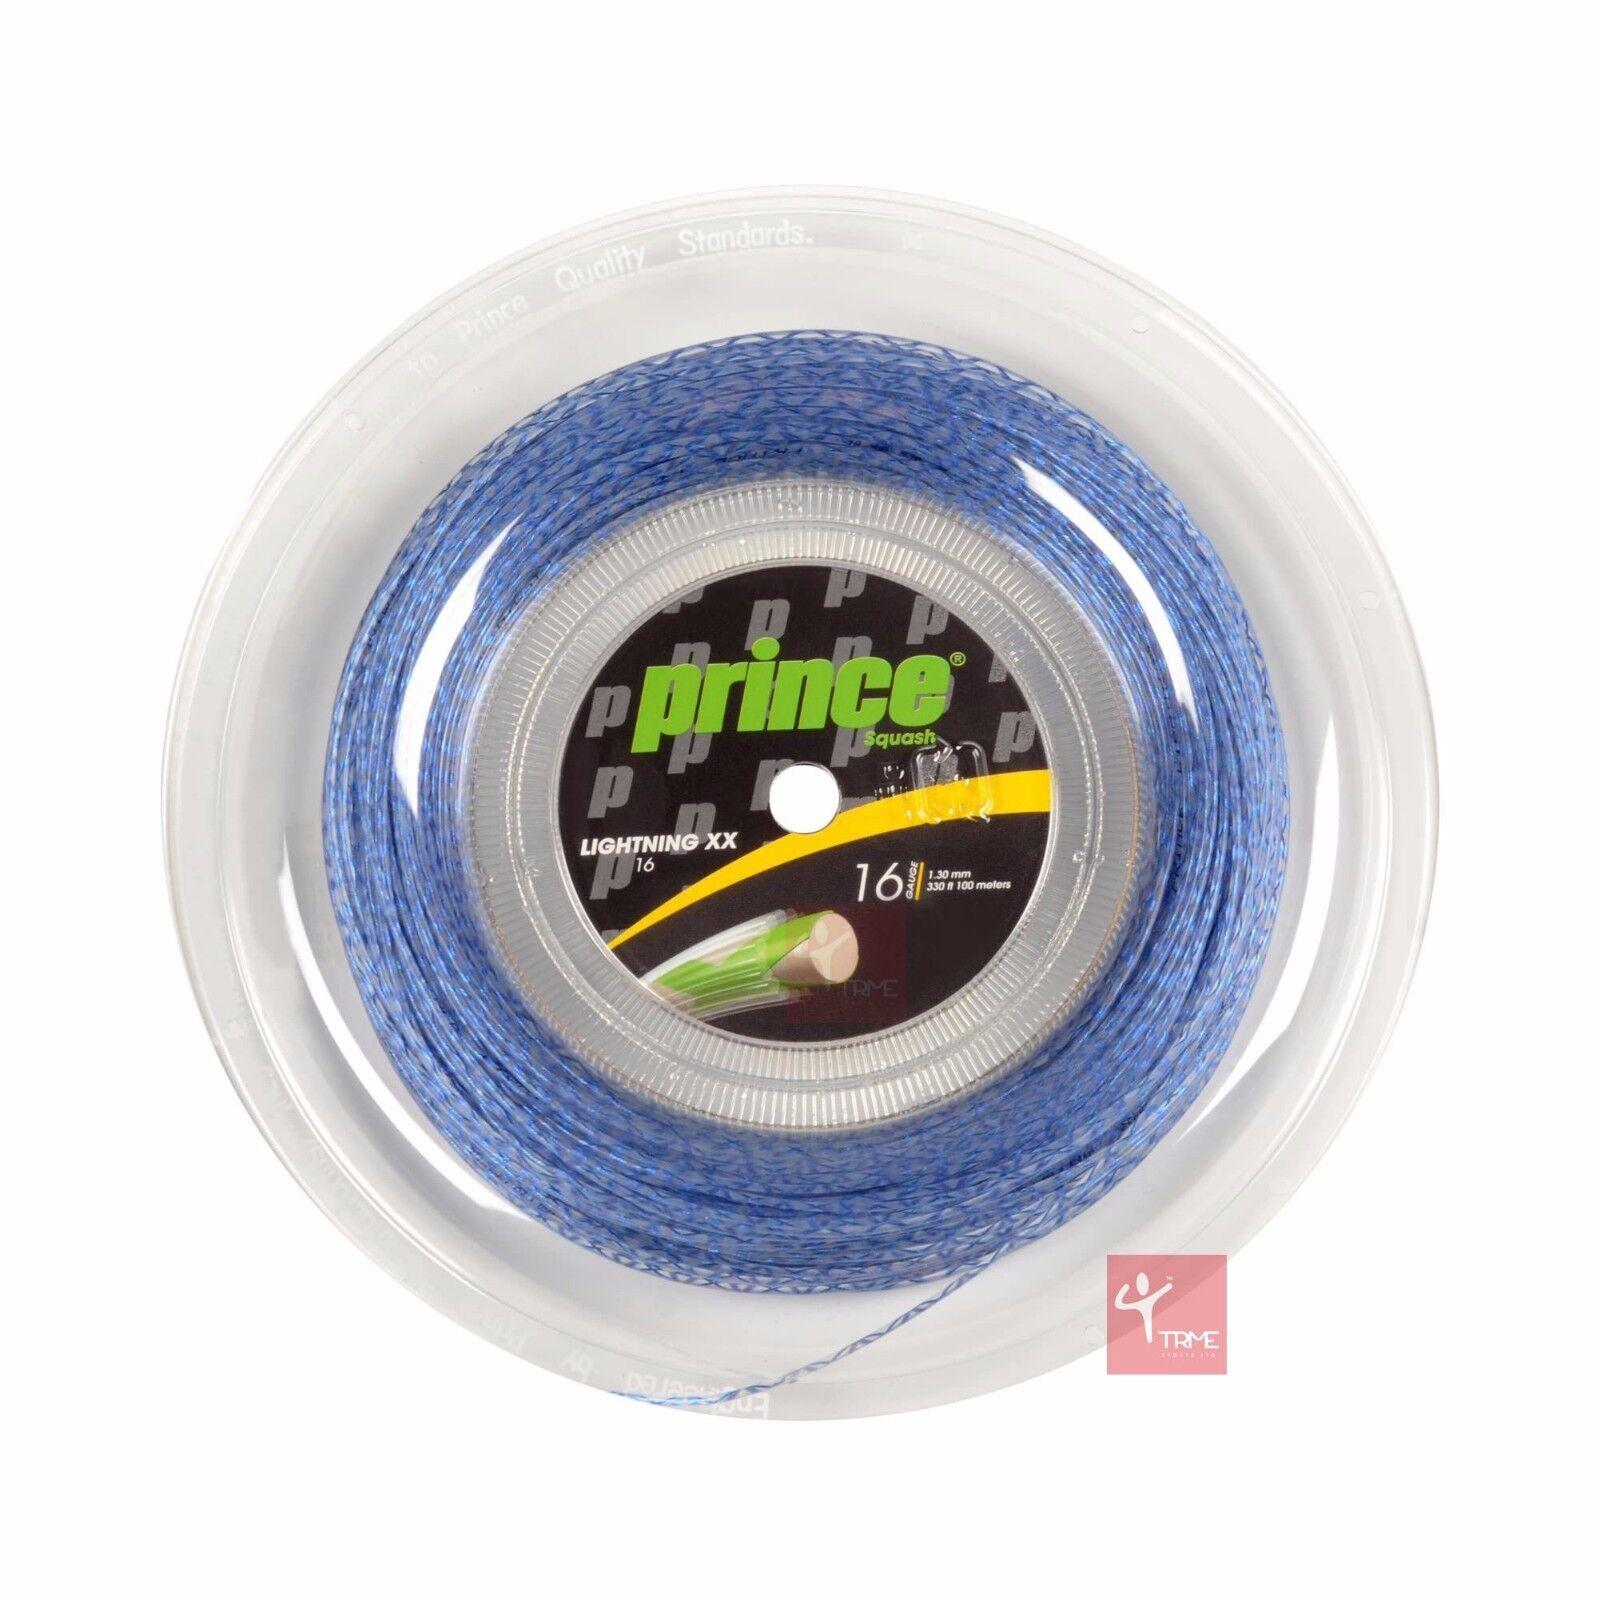 Prince Lightning XX Squash String 100m Reel 16   1.30mm - bluee